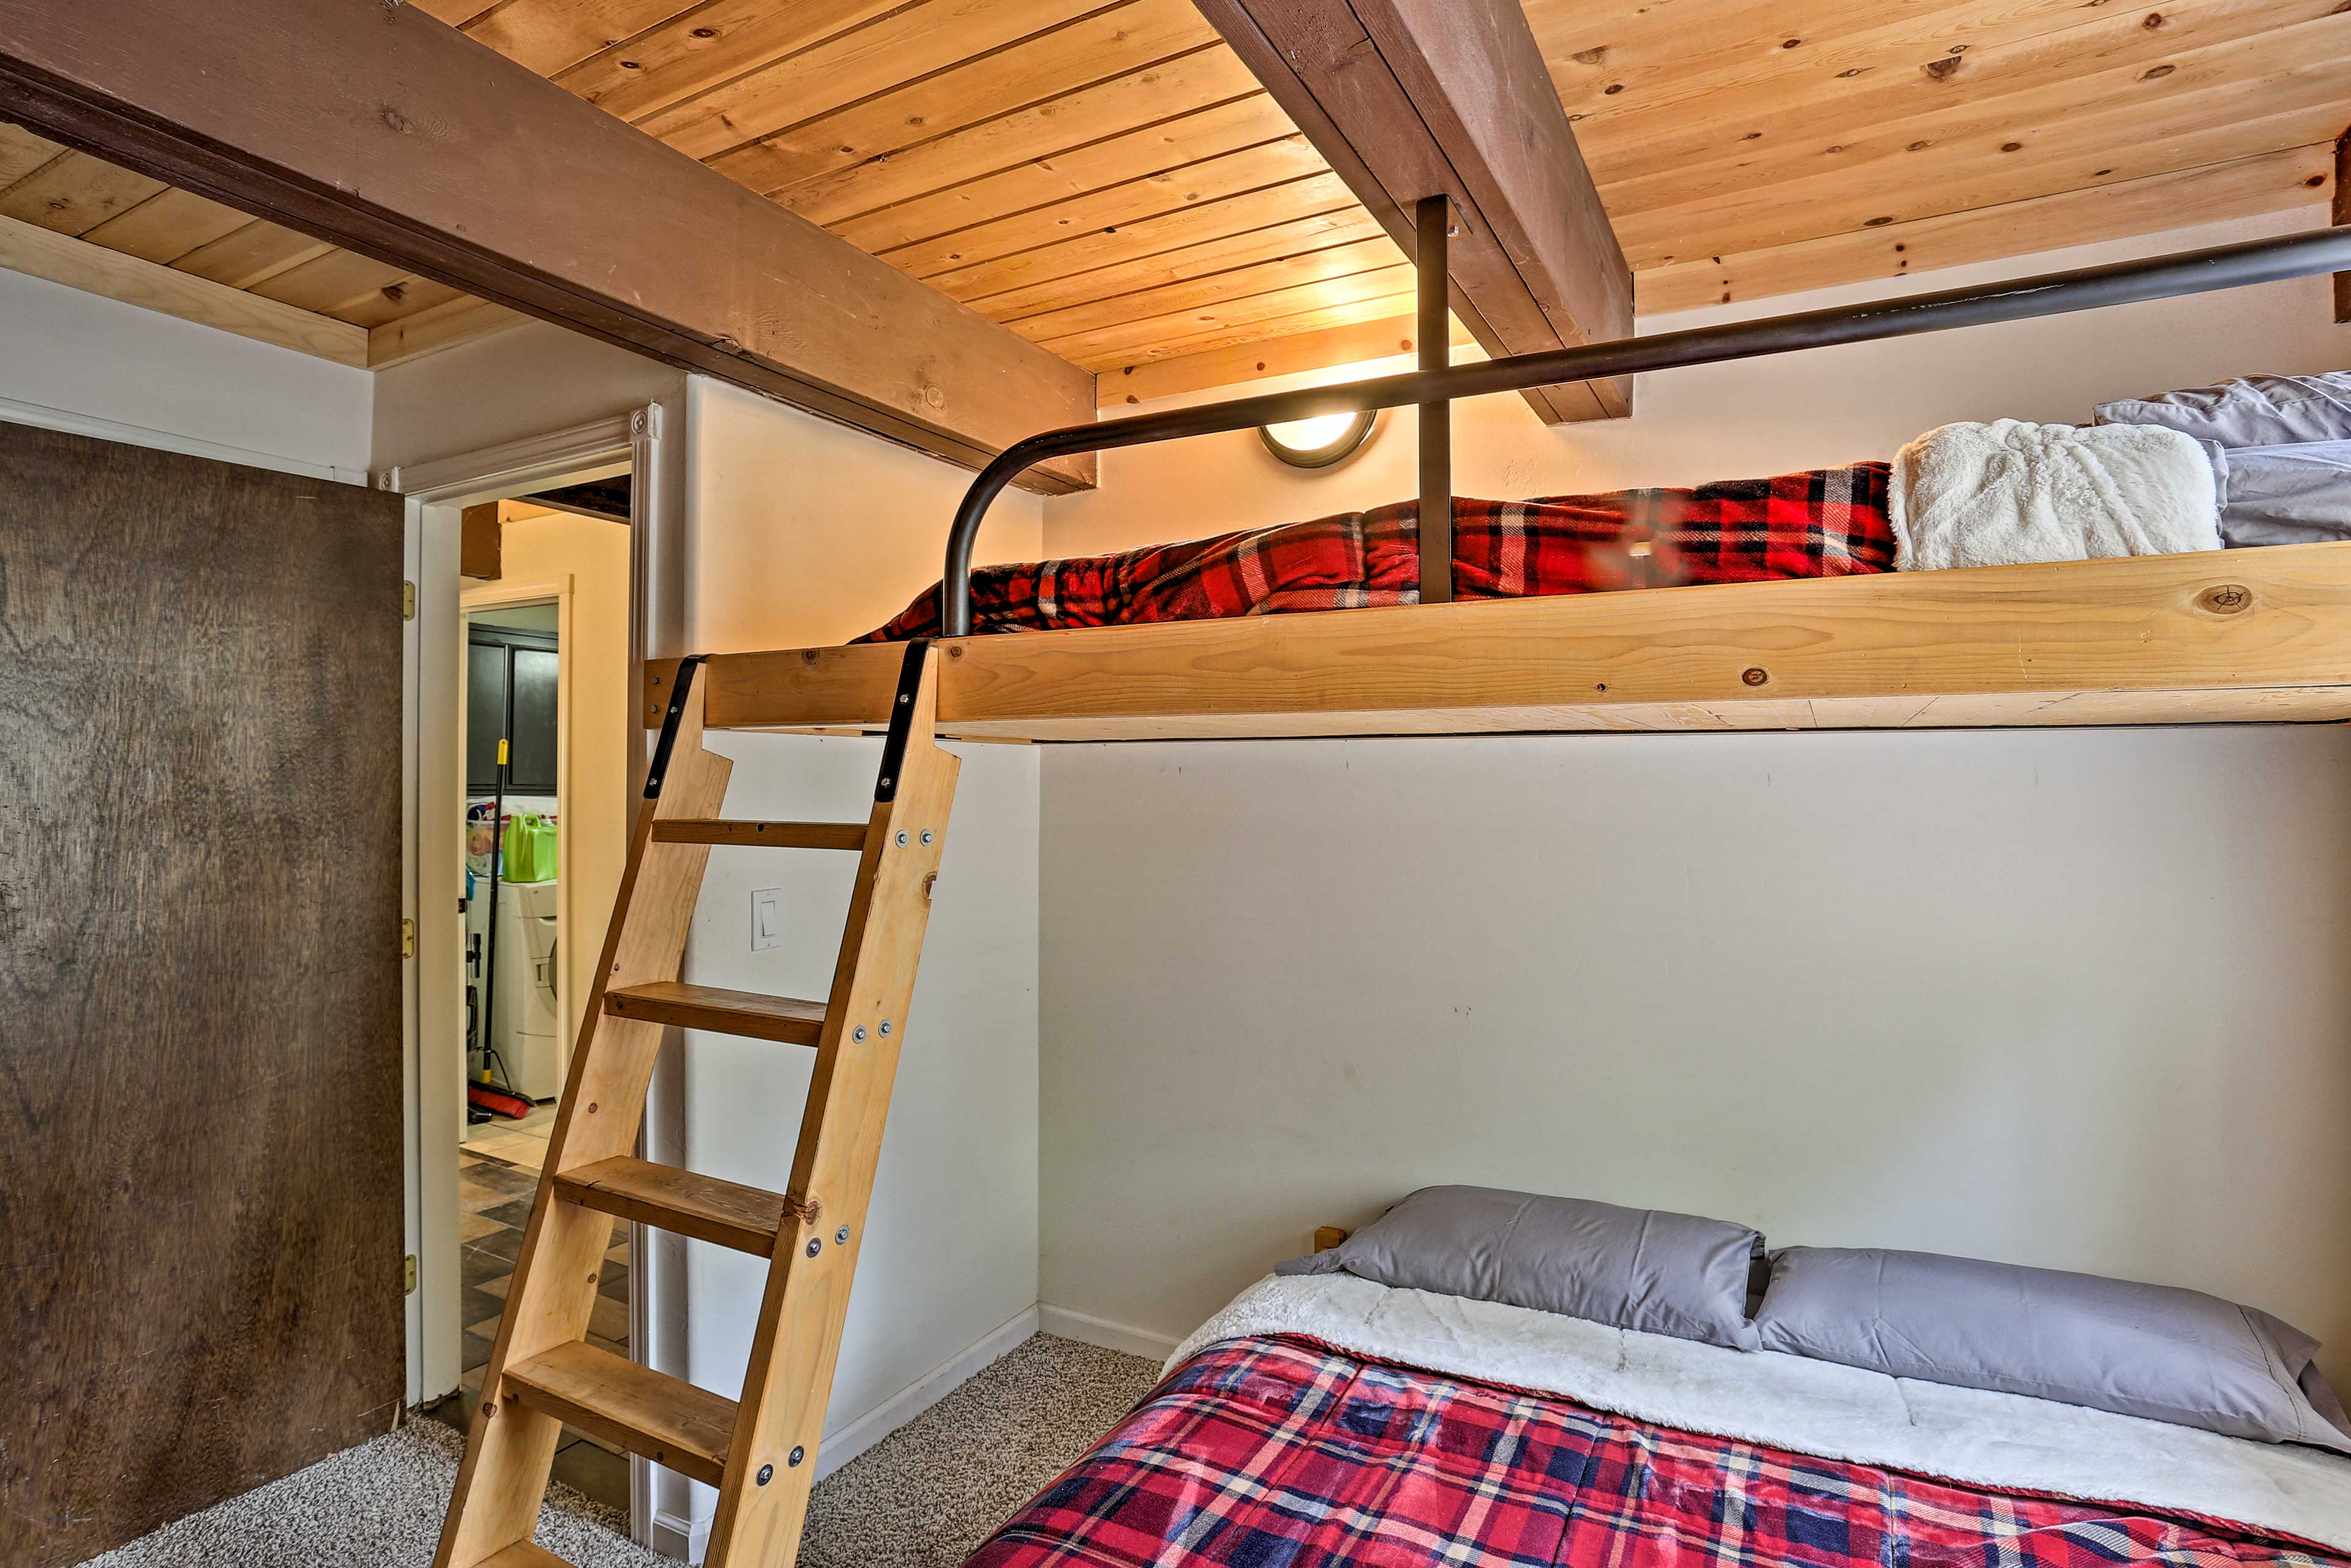 The third bedroom has a twin/queen bunk bed.